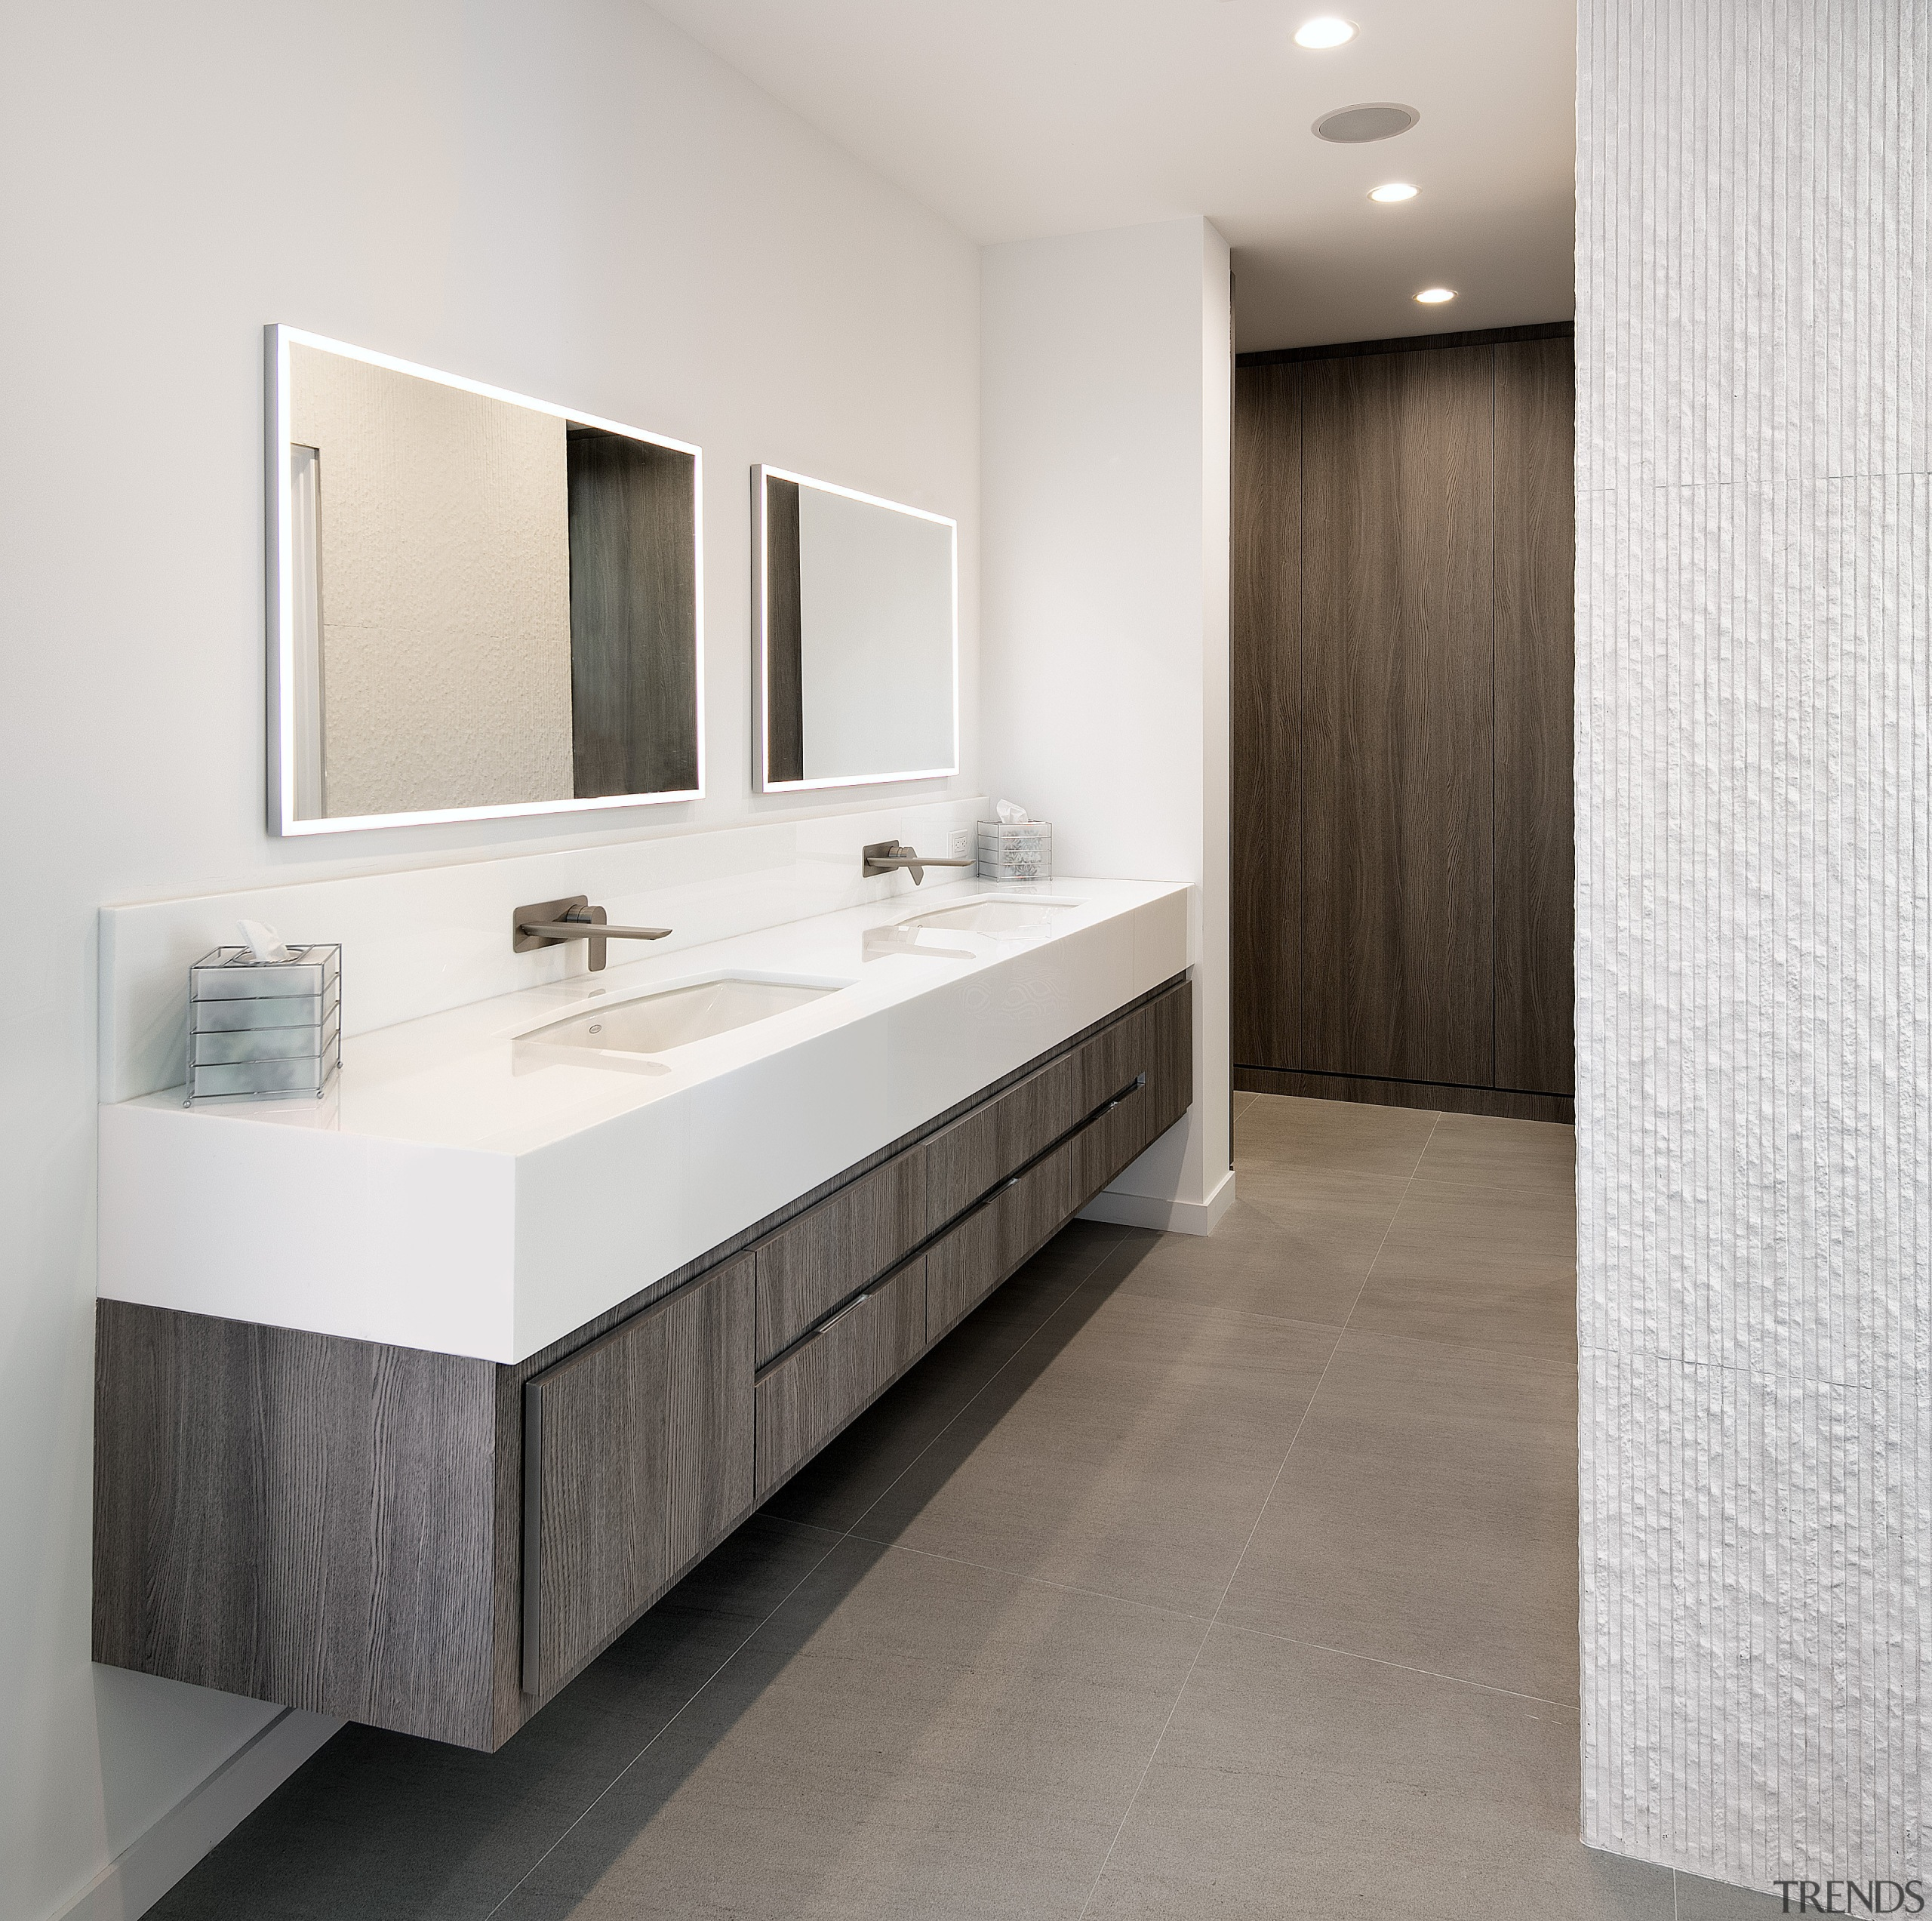 The vanity is tucked to the side of bathroom, bathroom accessory, bathroom cabinet, floor, flooring, interior design, product design, room, sink, tile, wall, white